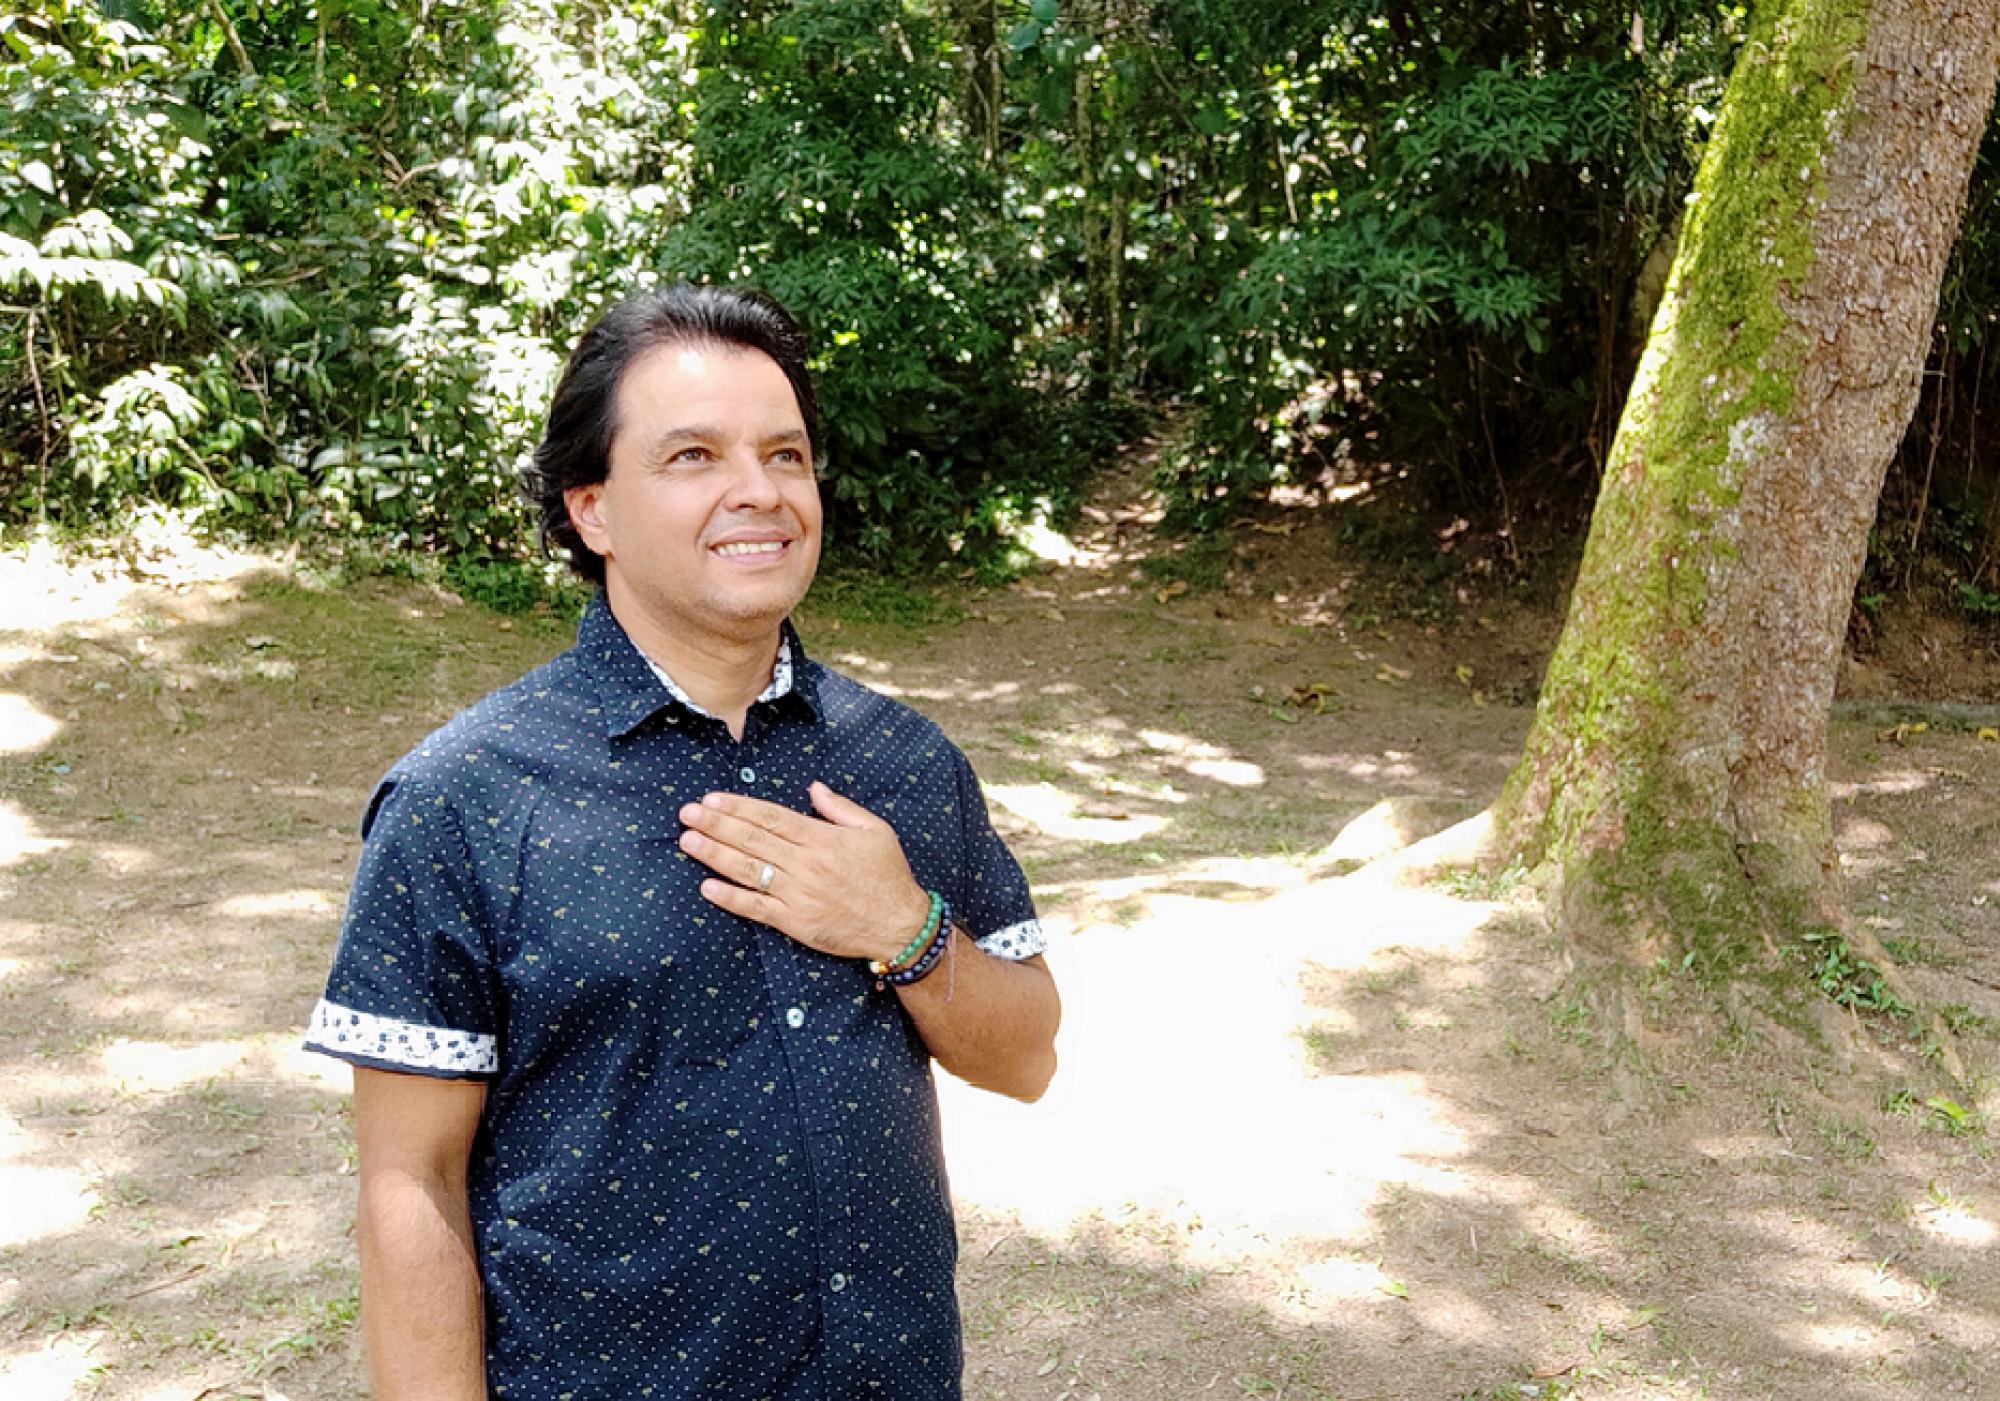 Mauricio Faria